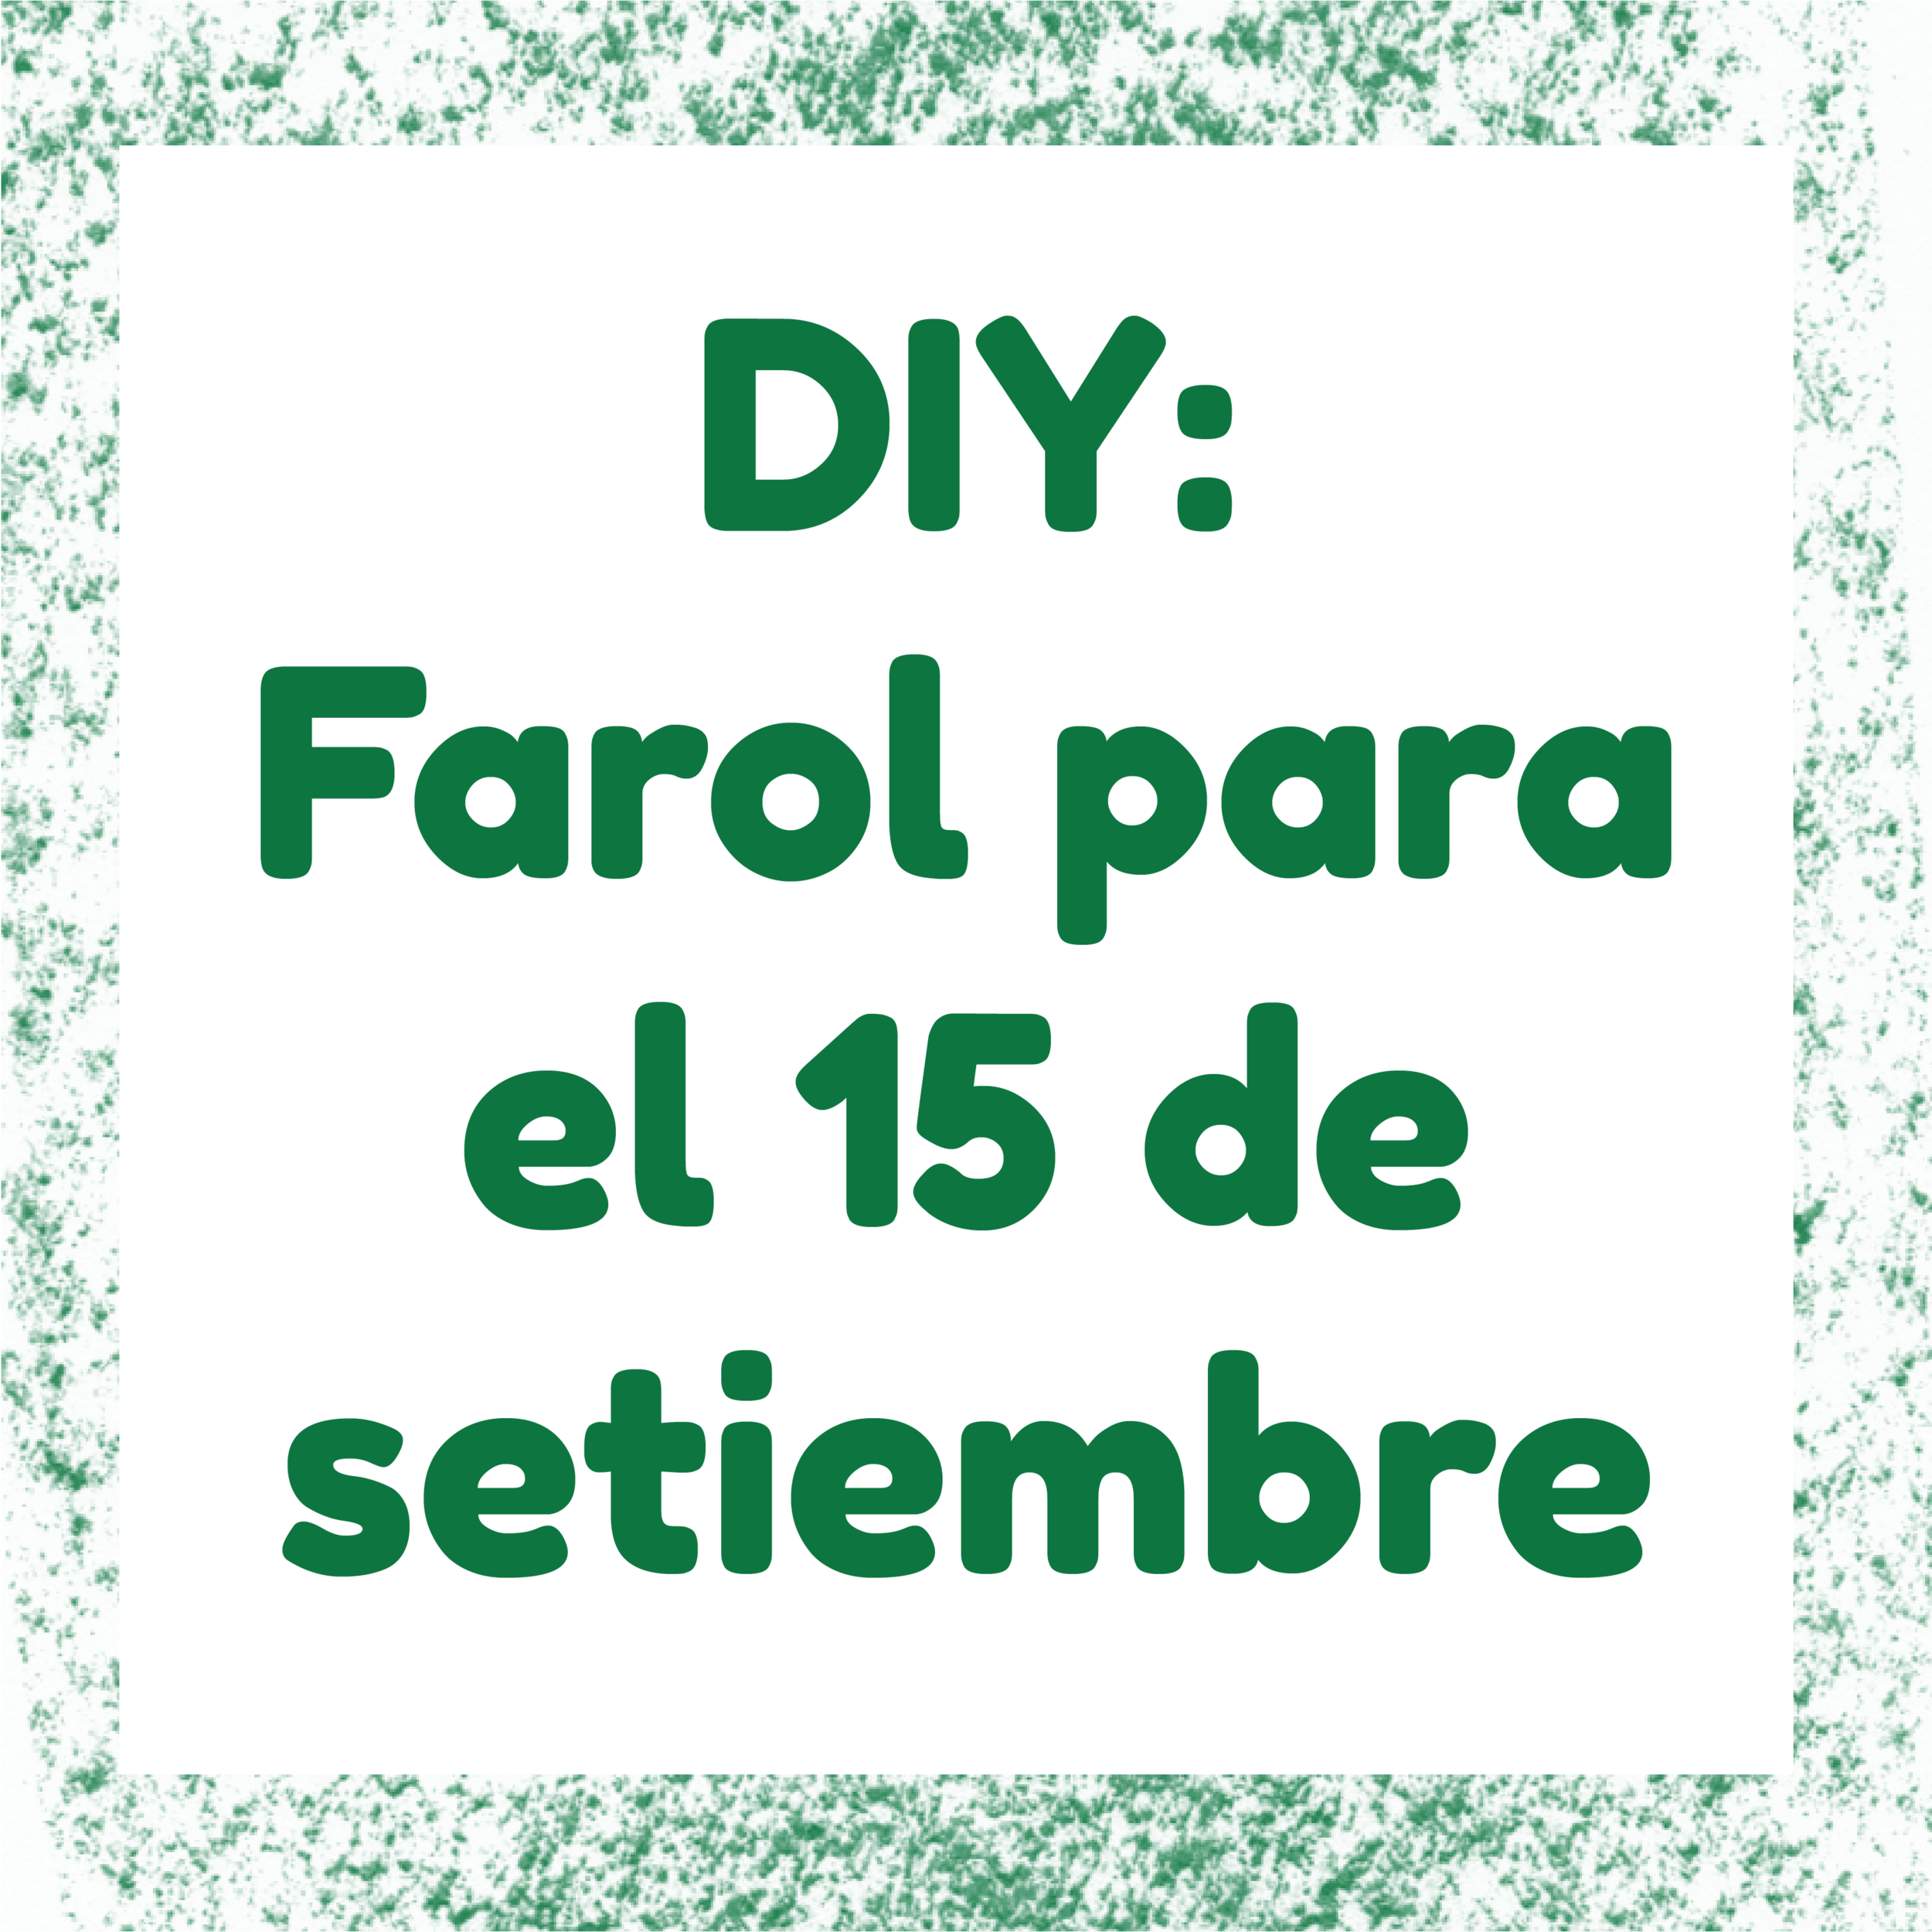 farol-01.png